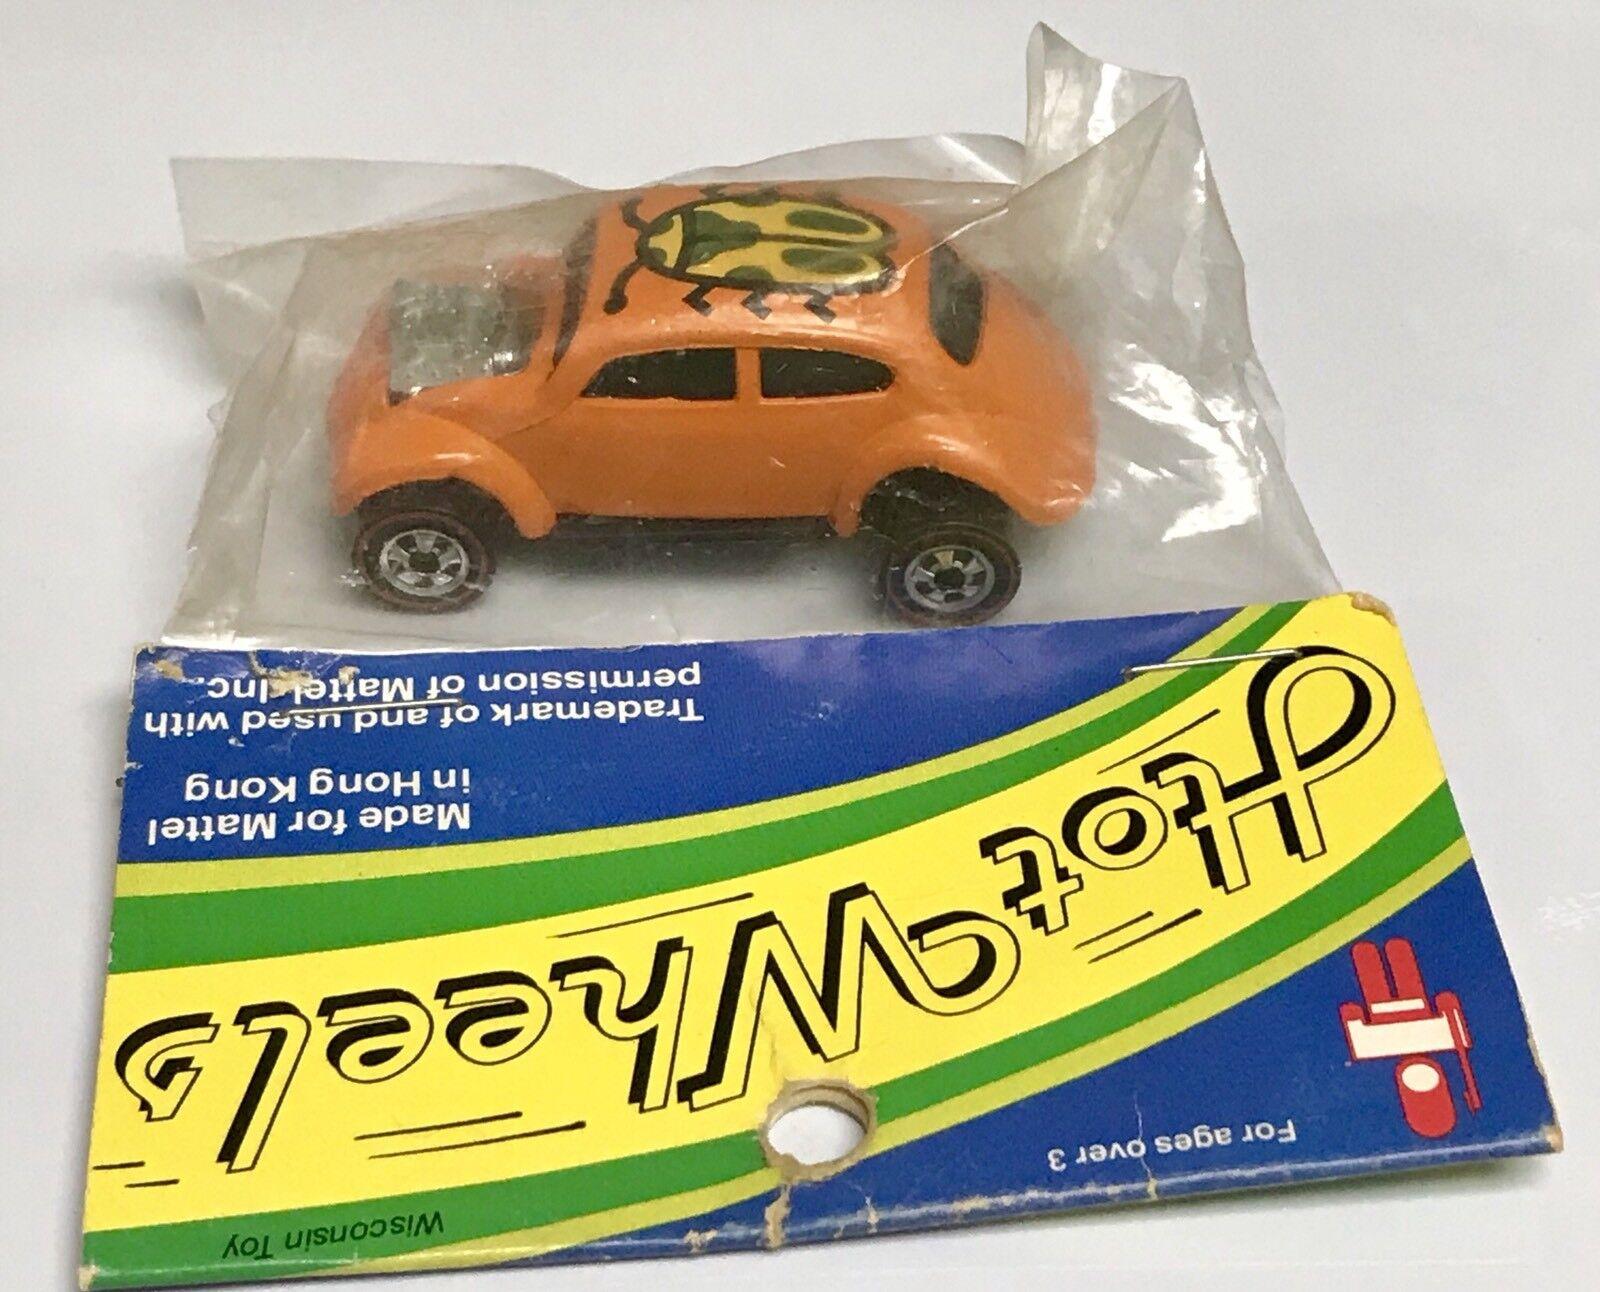 Wisconsin Toy VW Orange Bug Hot Wheels rotline HK Promo Sealed In Taschegie